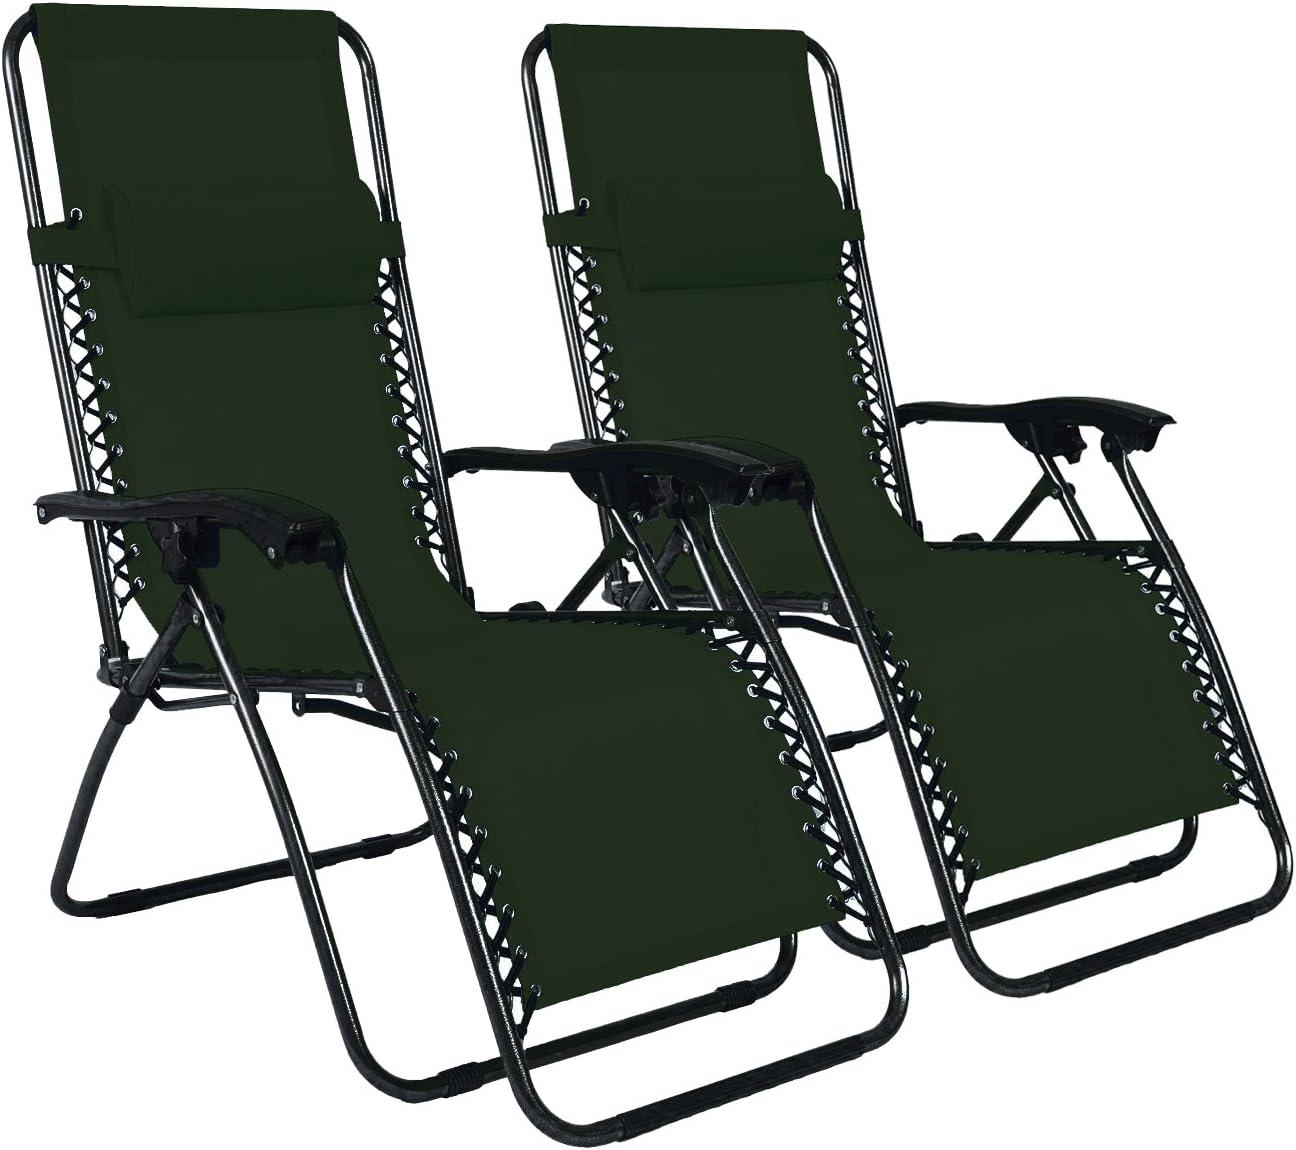 Odaof Zero Gravity Chair Green Set of 2